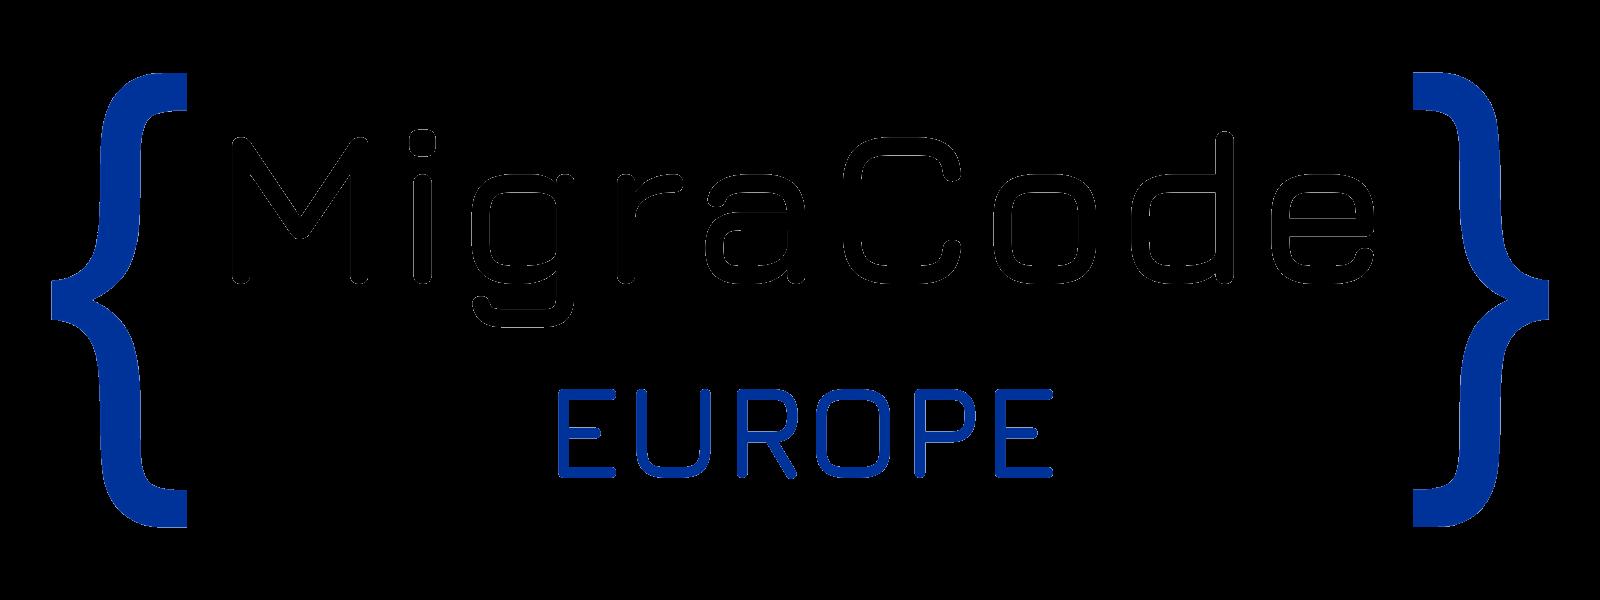 Migracode Europe